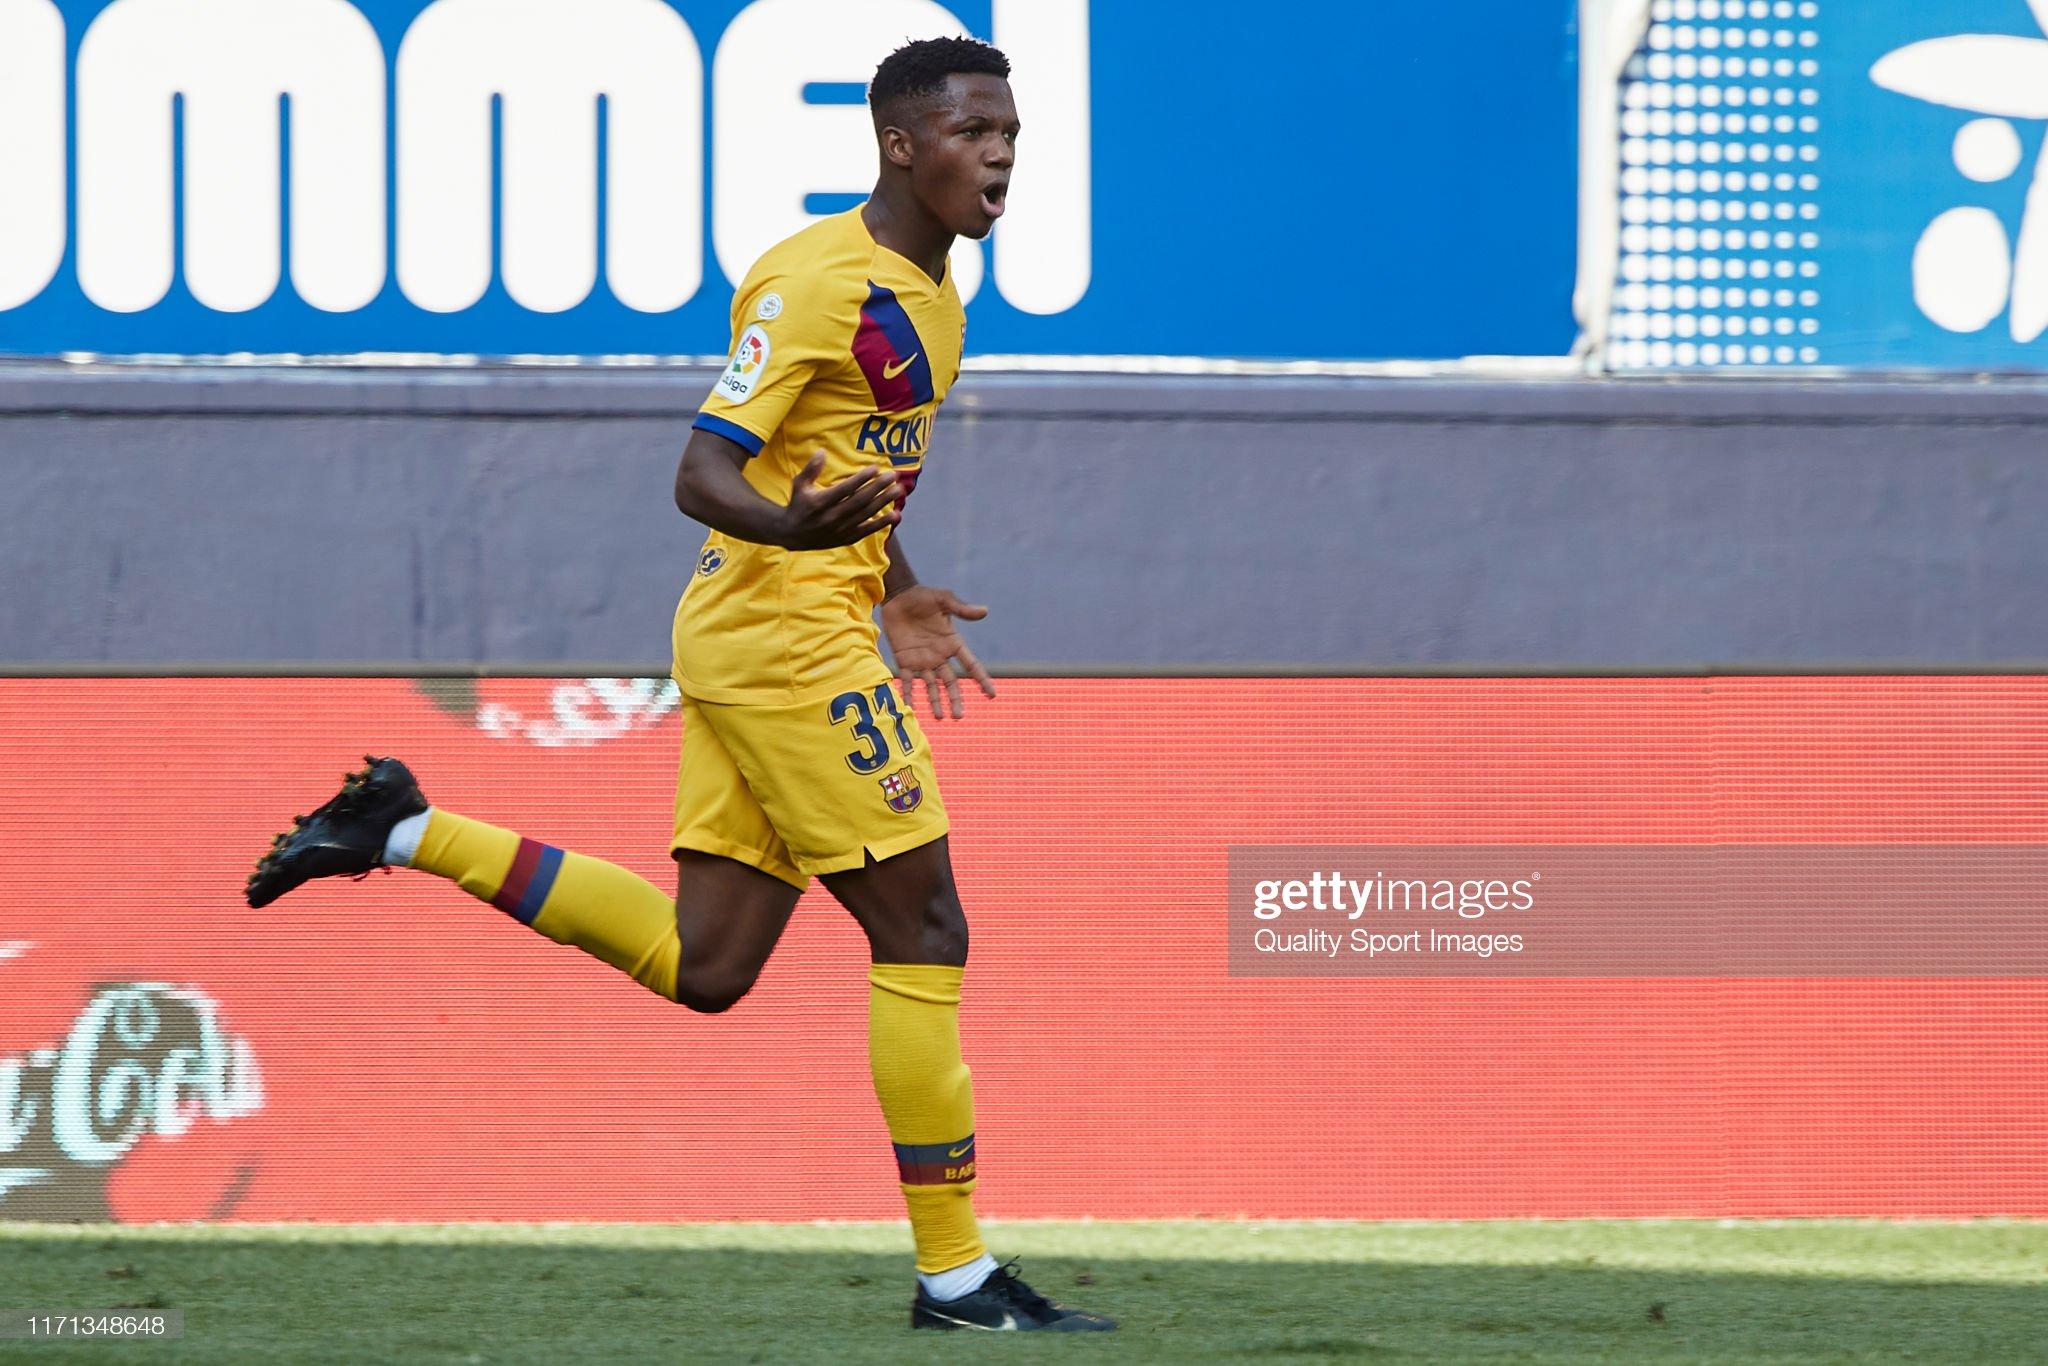 صور مباراة : أوساسونا - برشلونة 2-2 ( 31-08-2019 )  Anssumane-fati-of-fc-barcelona-celebrates-after-scoring-his-teams-picture-id1171348648?s=2048x2048